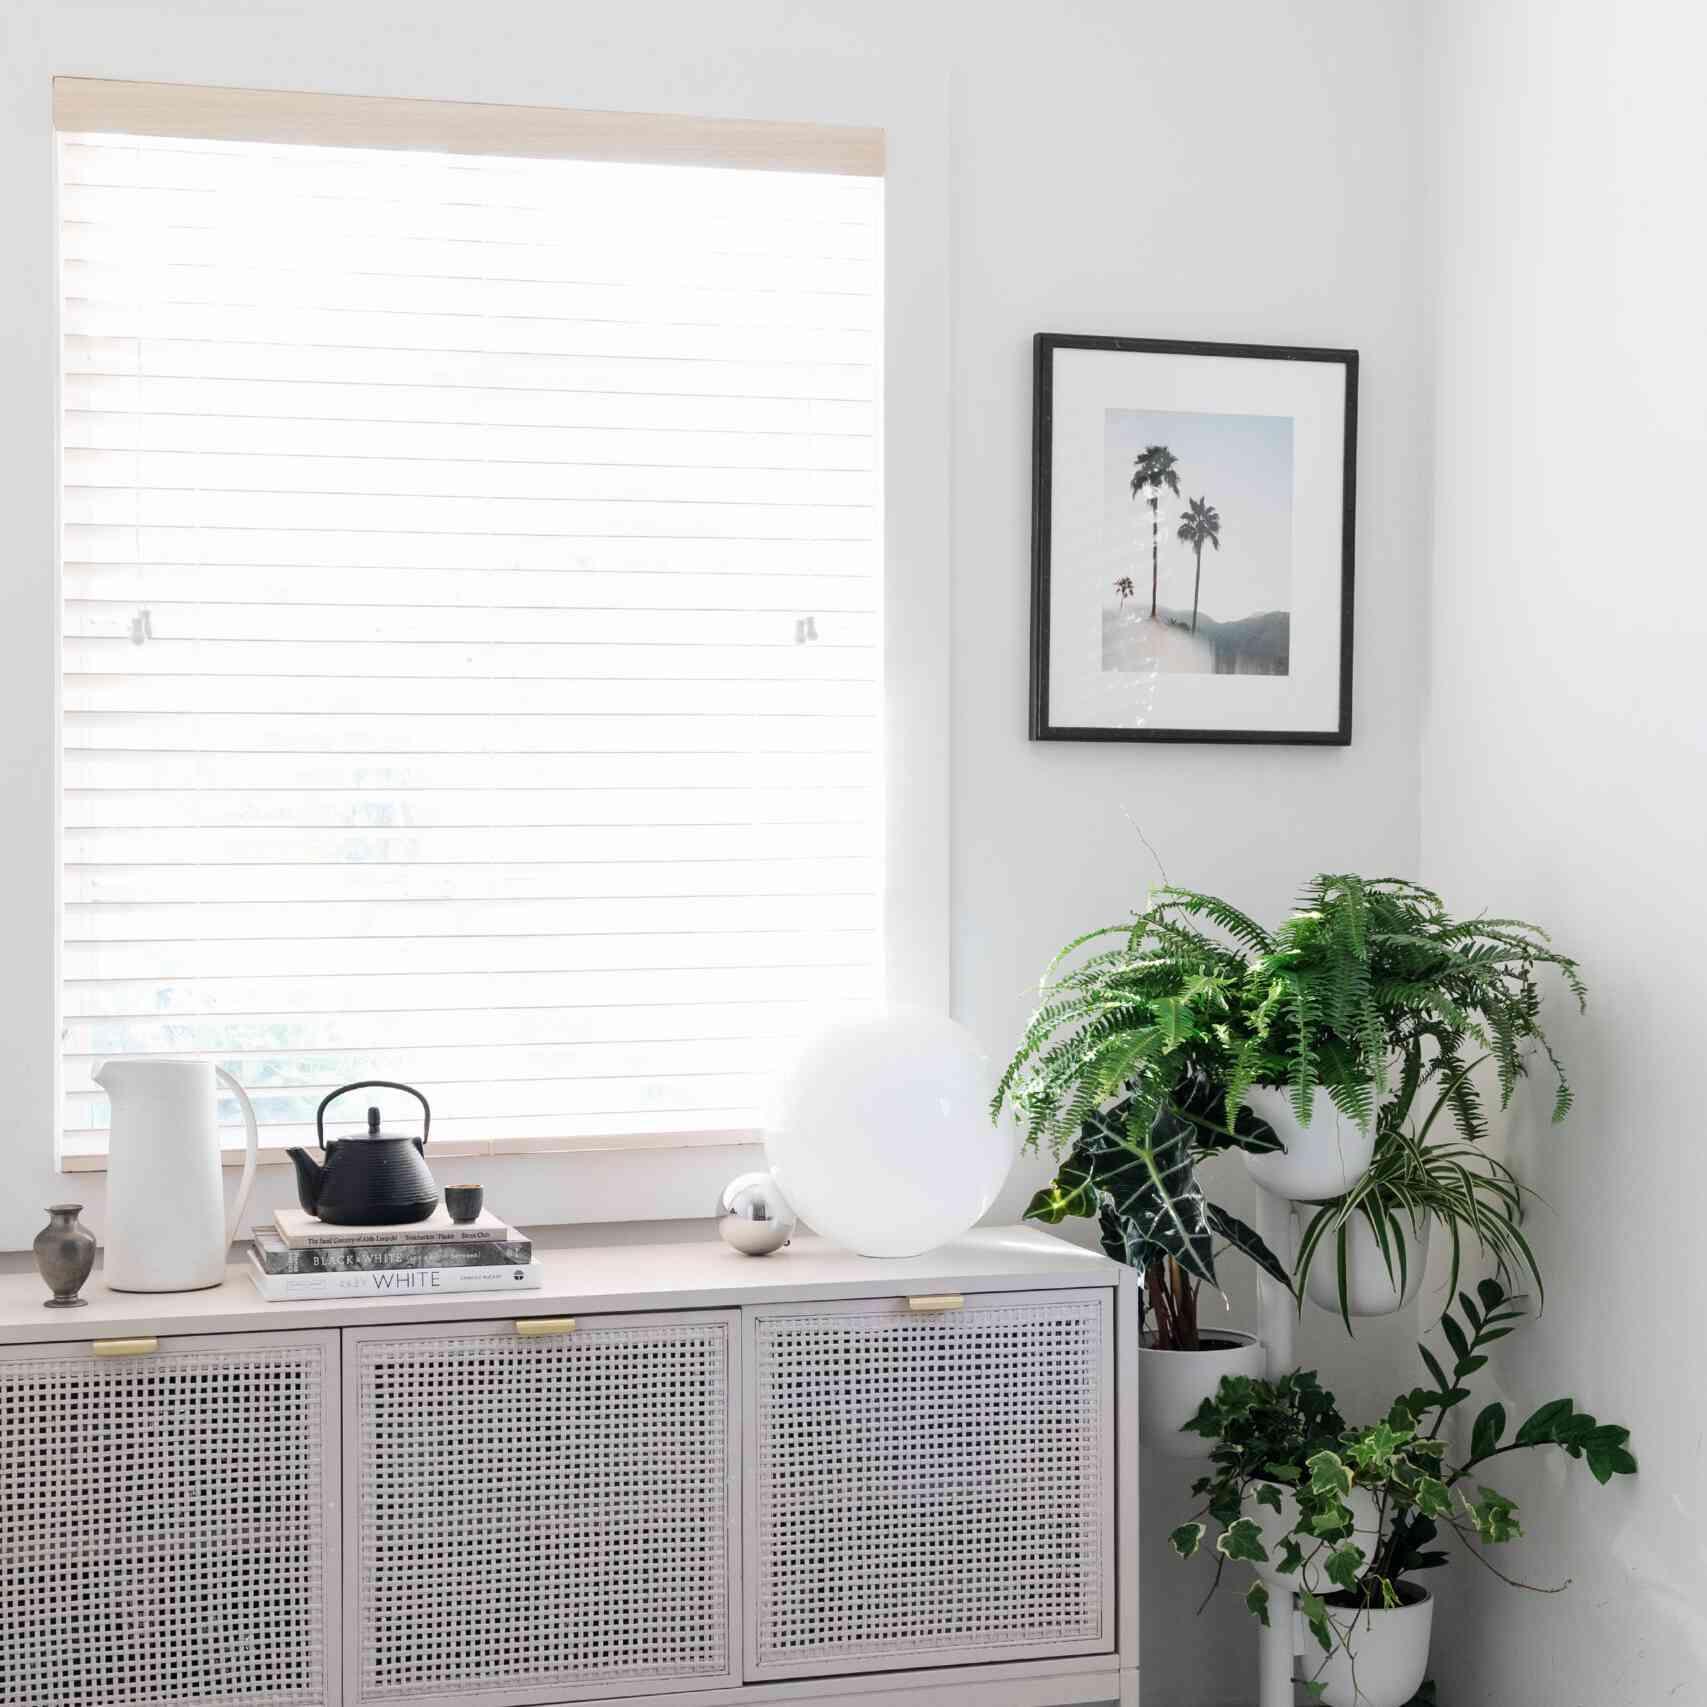 best houseplant for cats: Boston fern